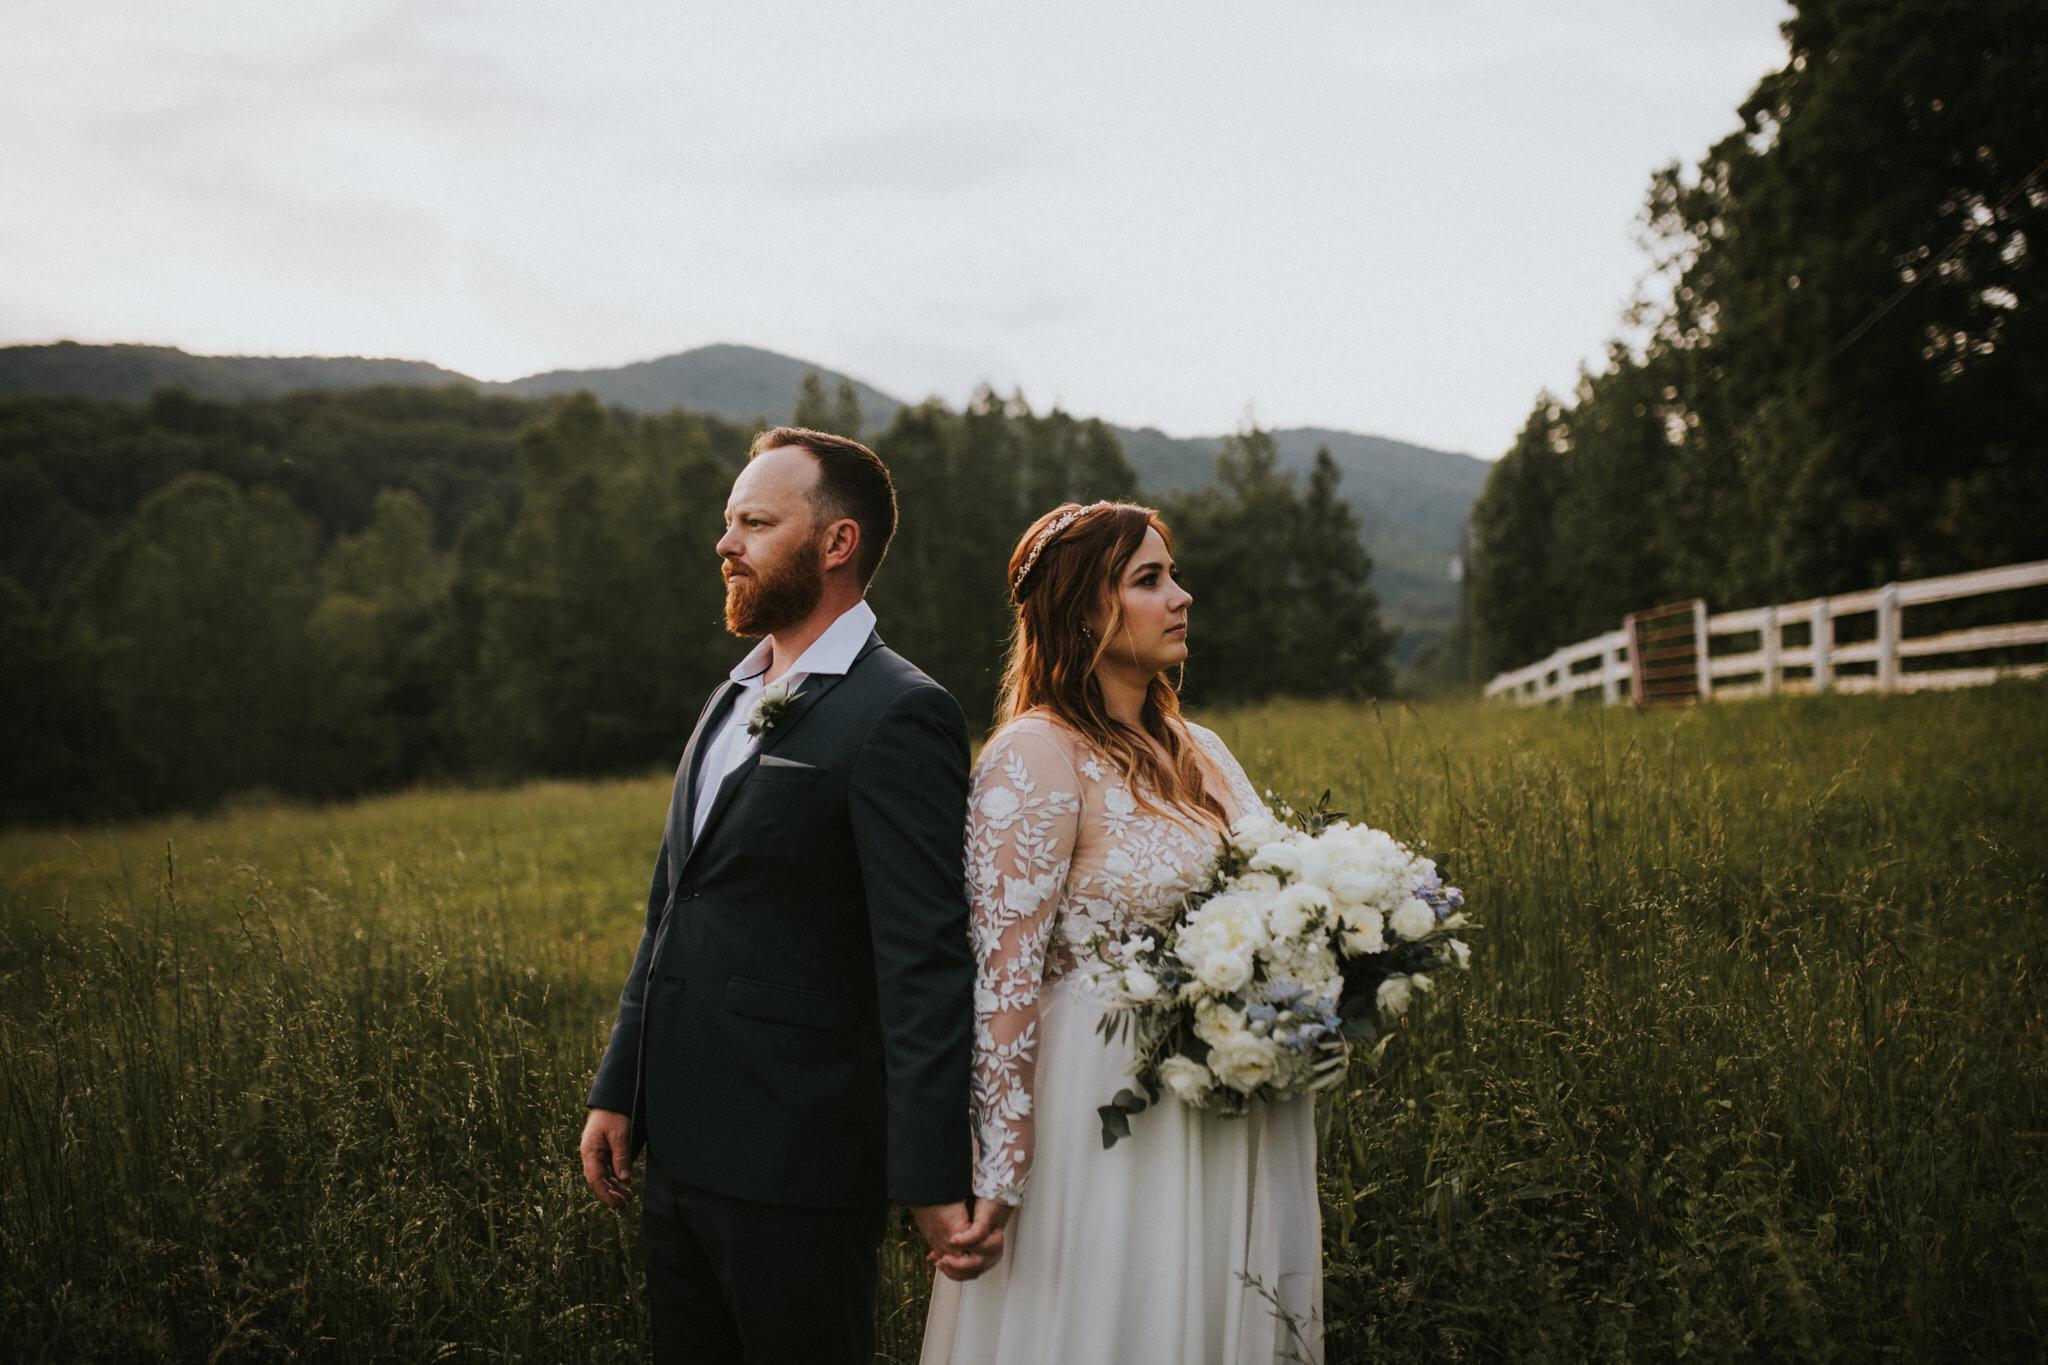 KateMatt-North-Georgia-Wedding-Photographer-Mountain-Laurel-Farm-142.jpg